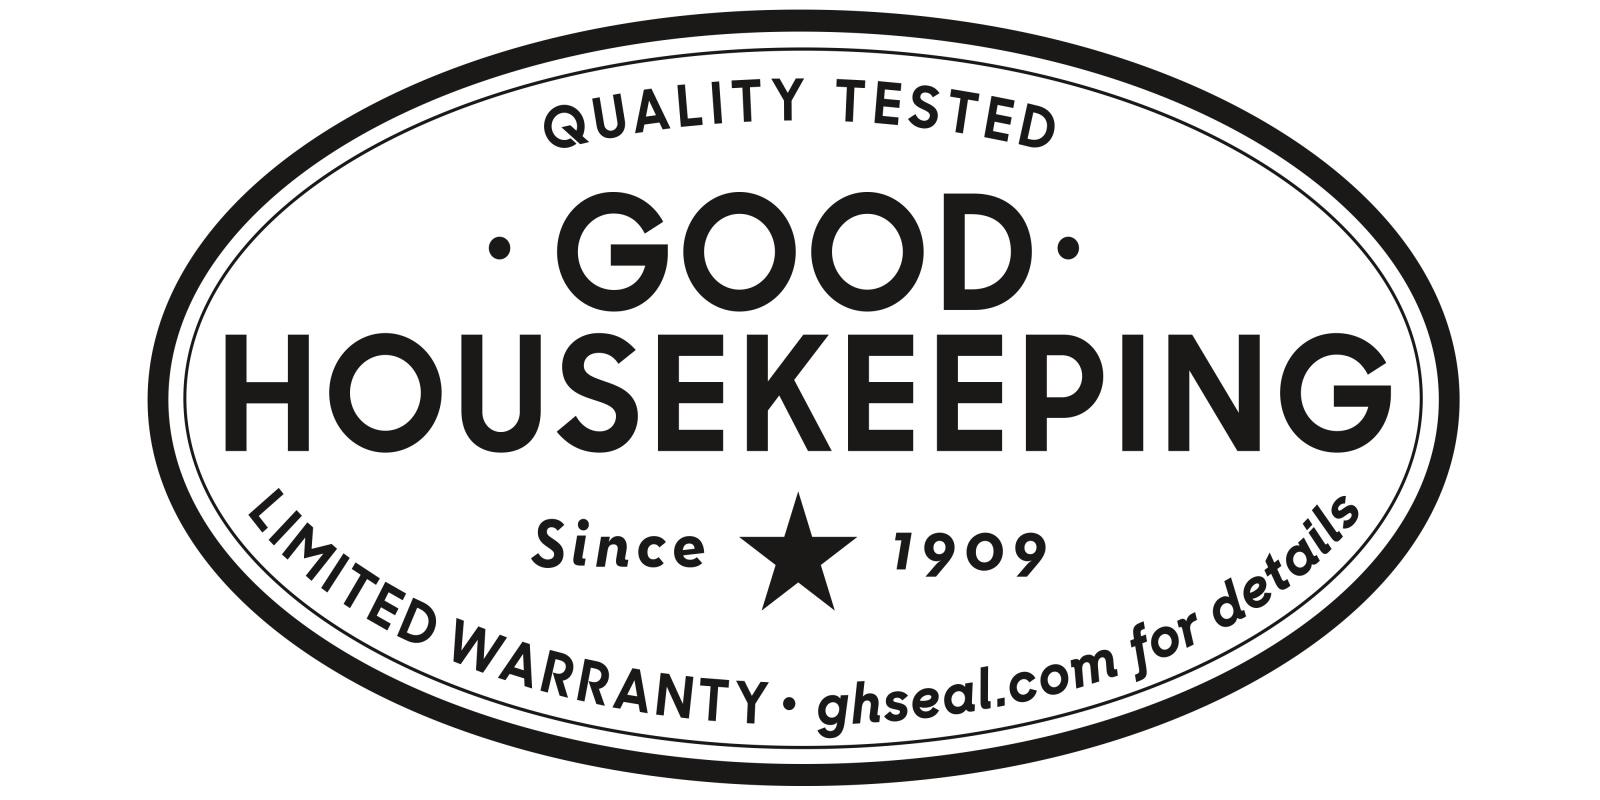 Caesarstone Backed by Good Housekeeping Seal